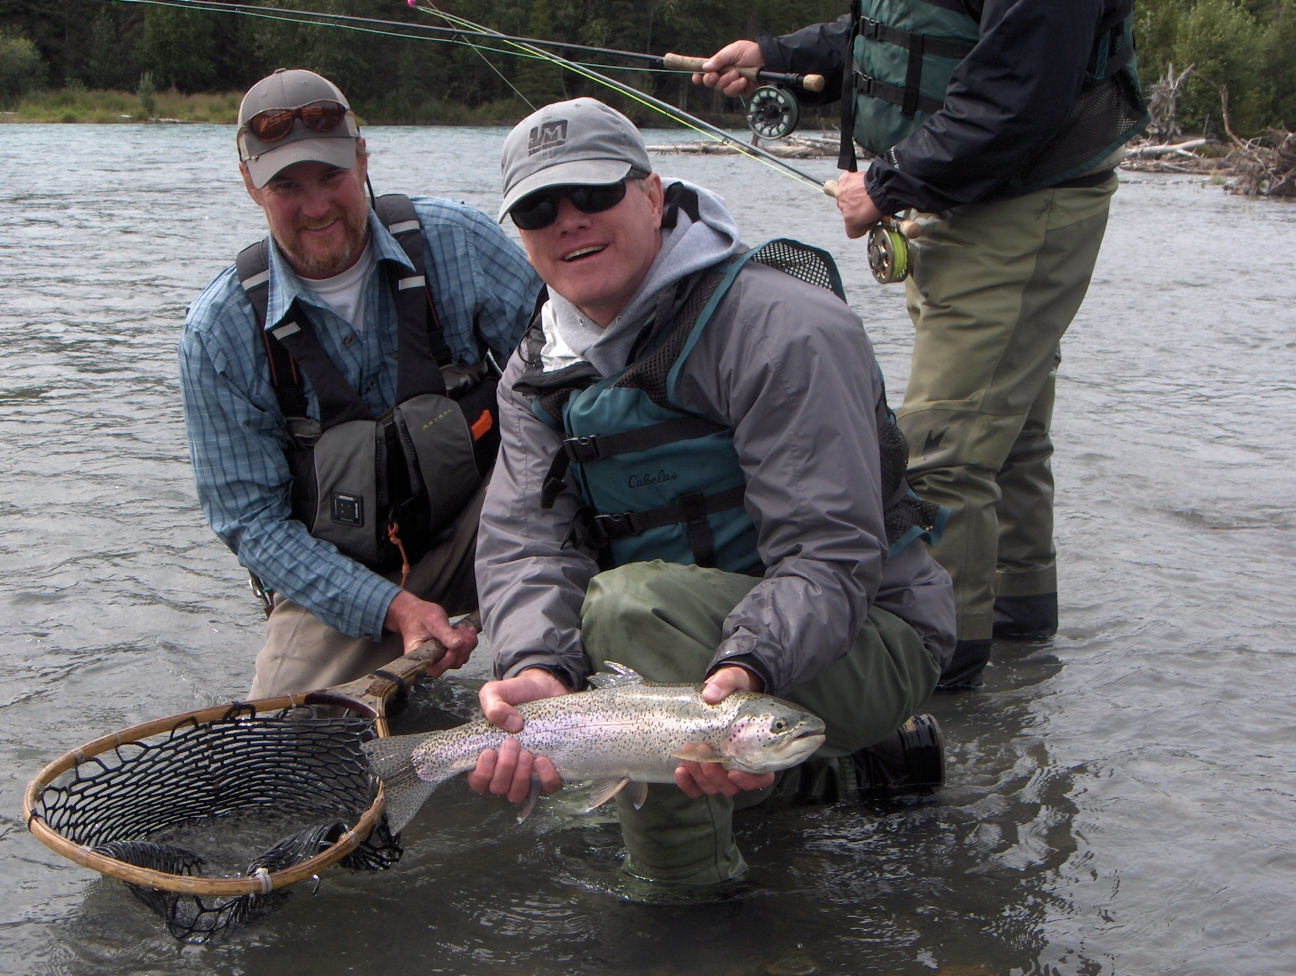 Kenai river fly fishing guided alaska fly fishing for Fly fishing alaska